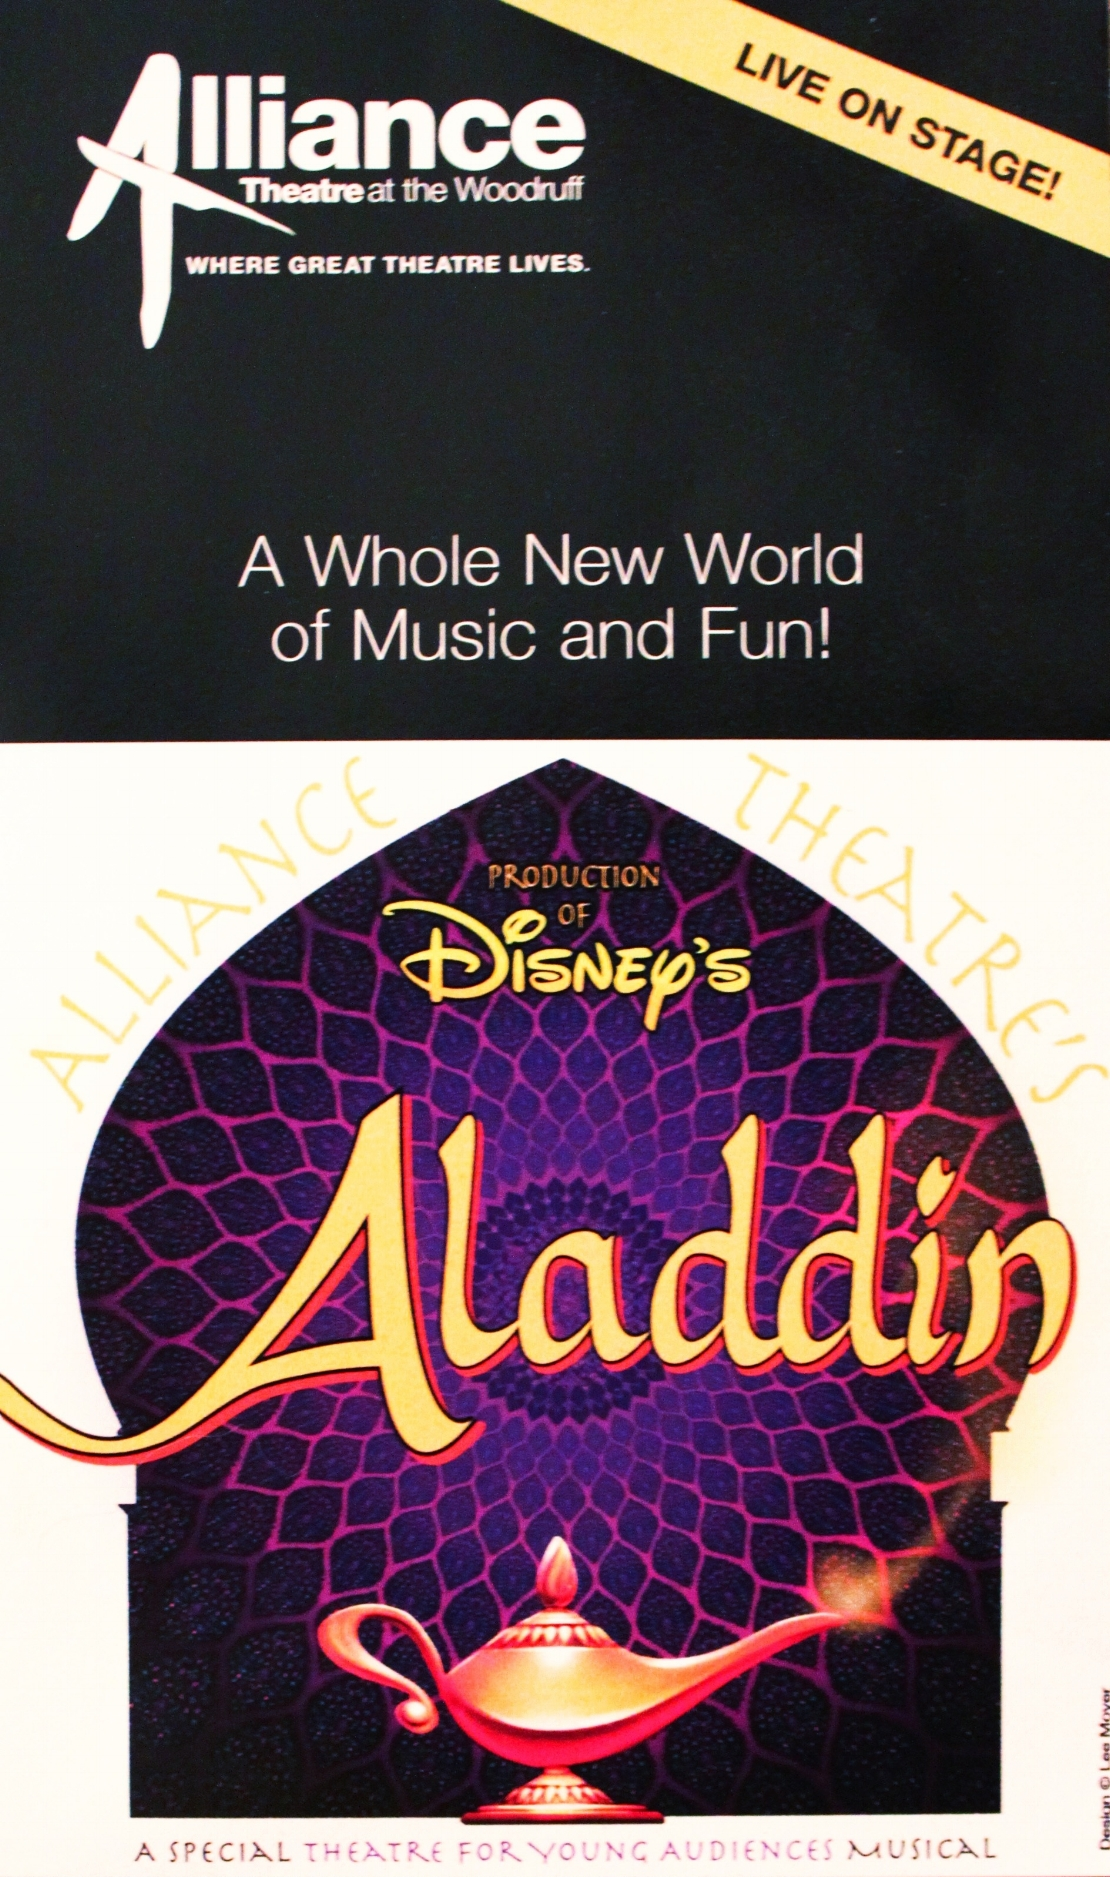 AladdinPoster.jpg